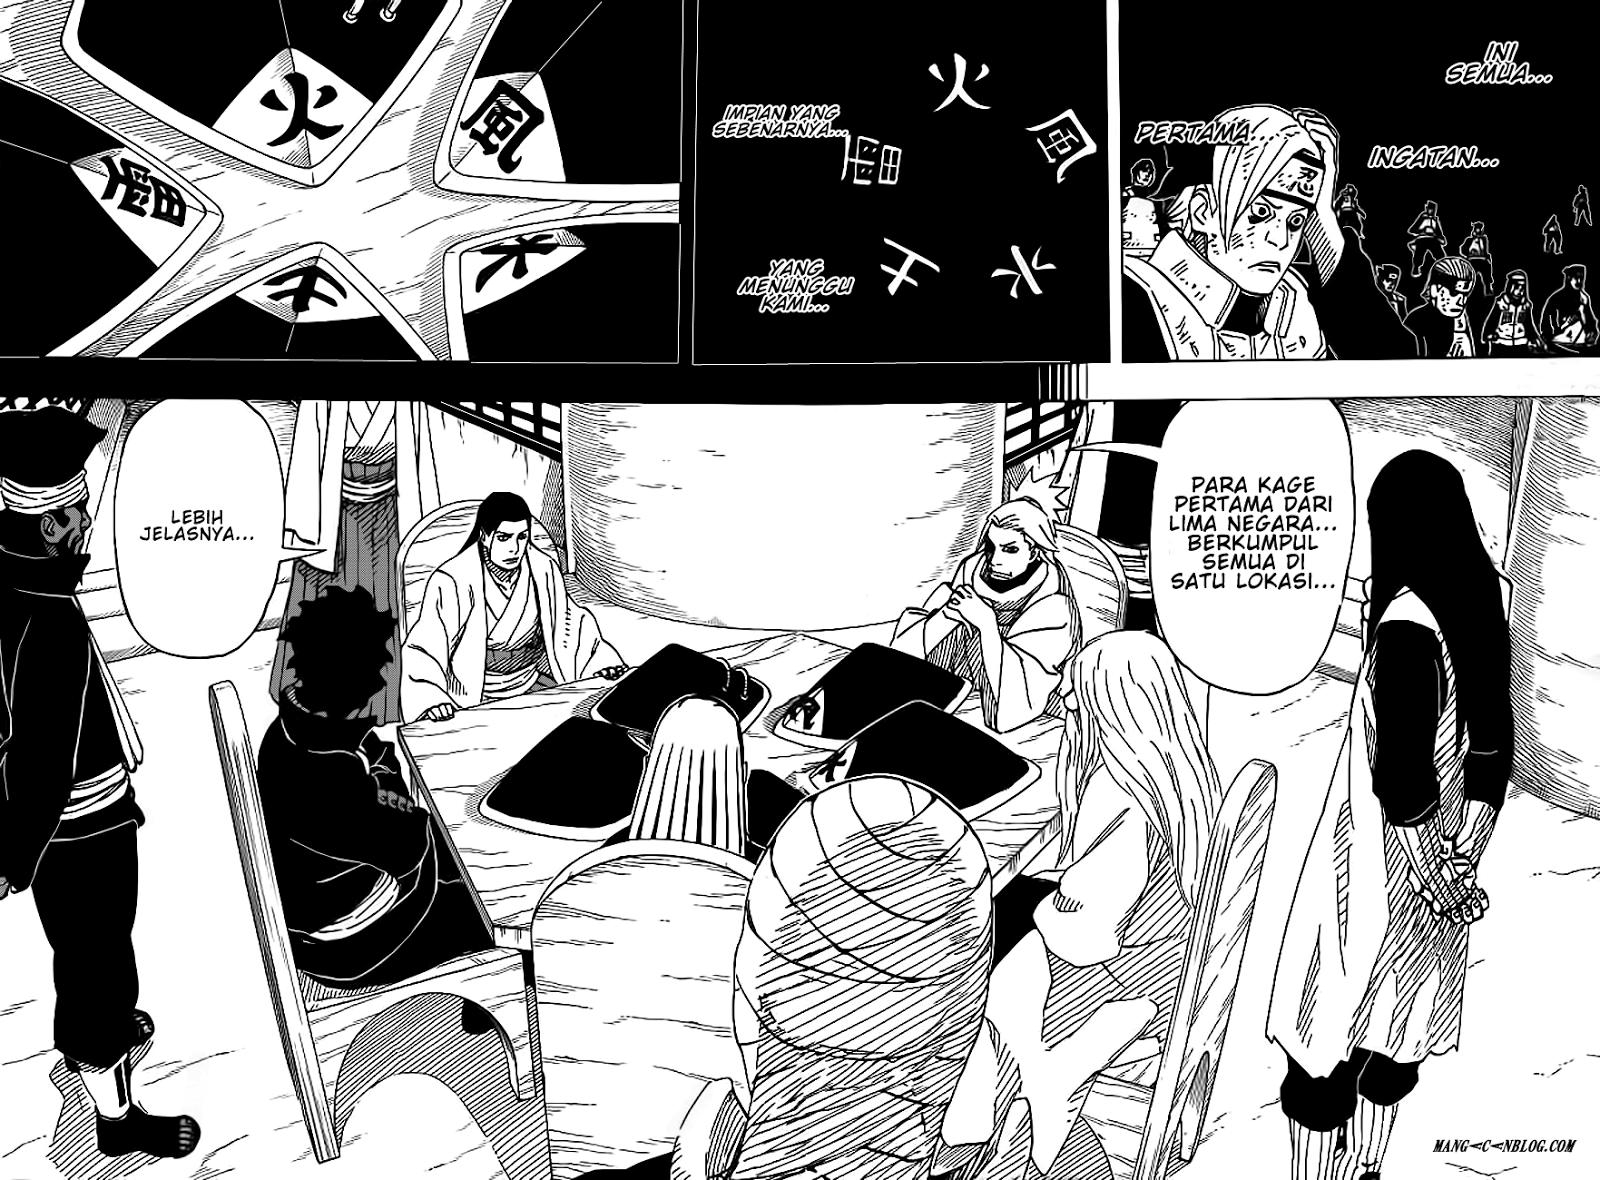 Komik naruto 648 - impian seorang shinobi 649 Indonesia naruto 648 - impian seorang shinobi Terbaru 5|Baca Manga Komik Indonesia|Mangacan